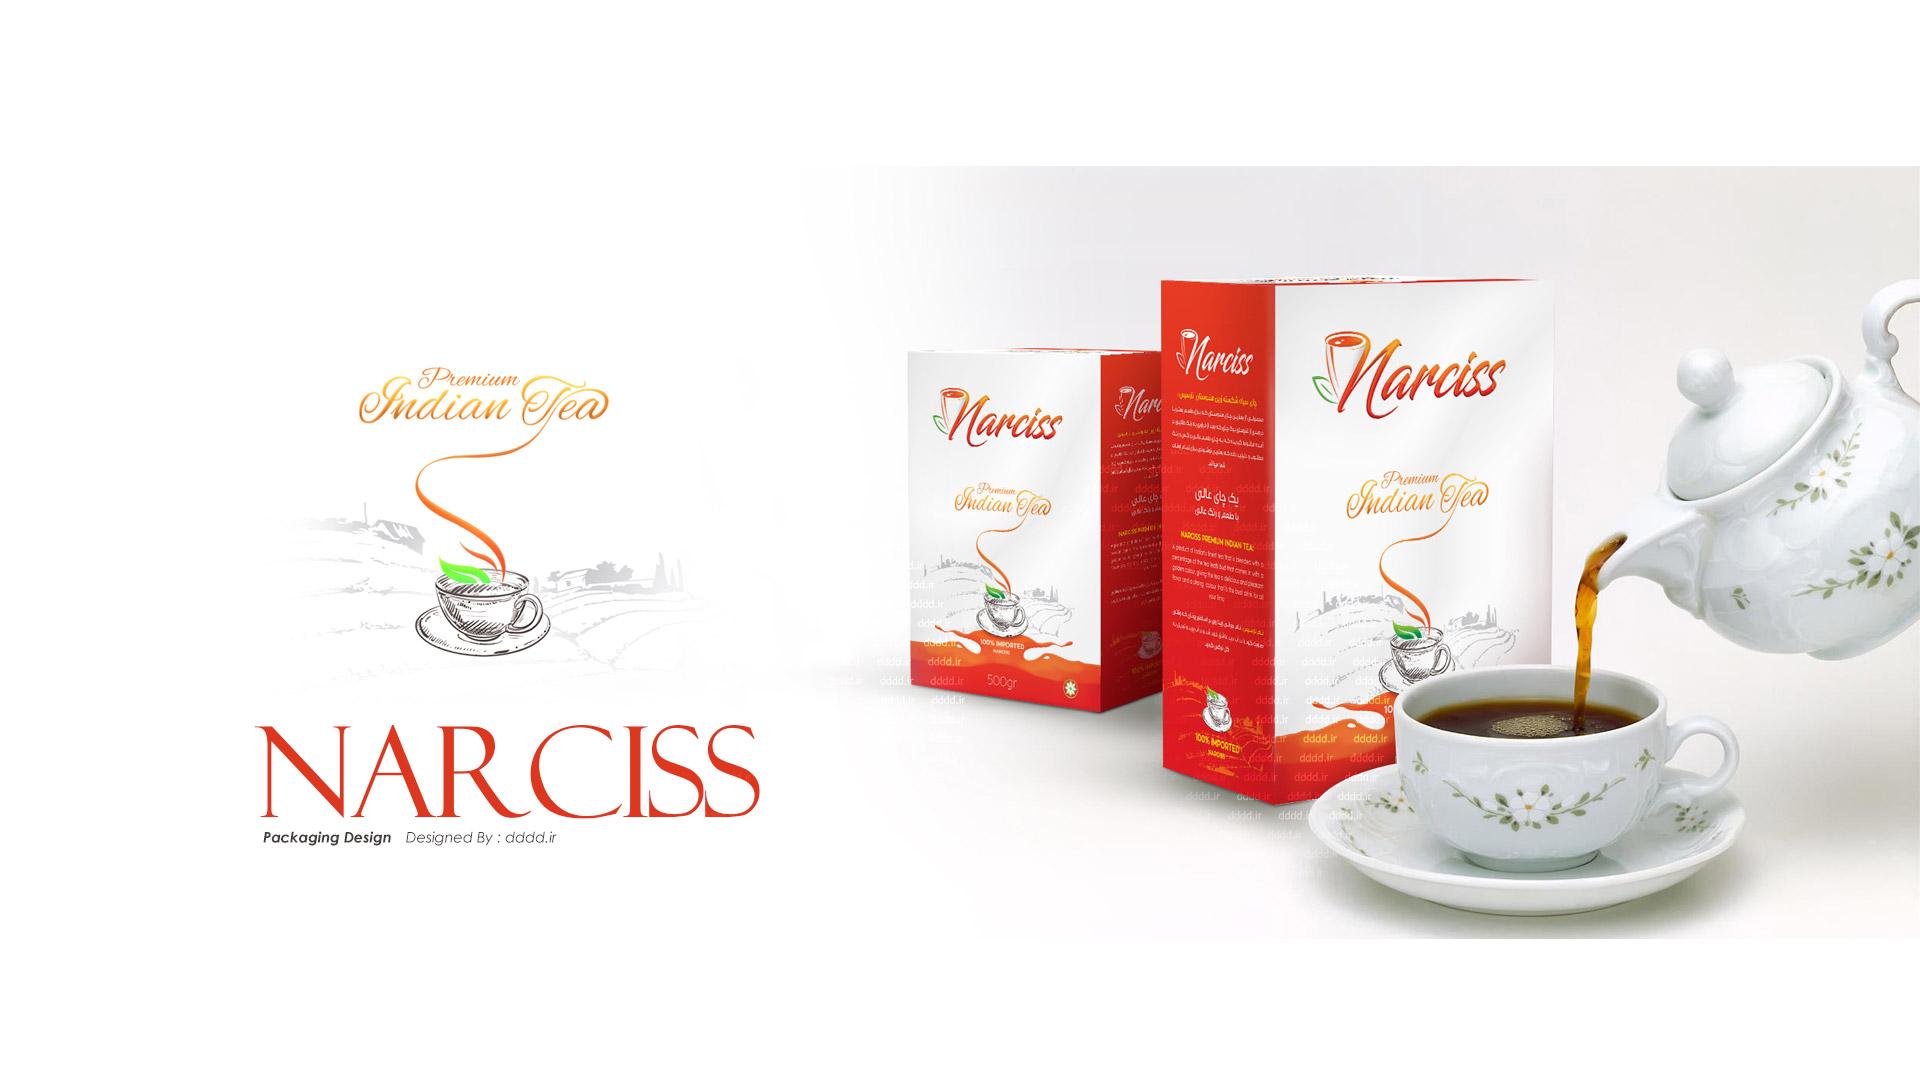 طراحی بسته بندی چای نارسیس